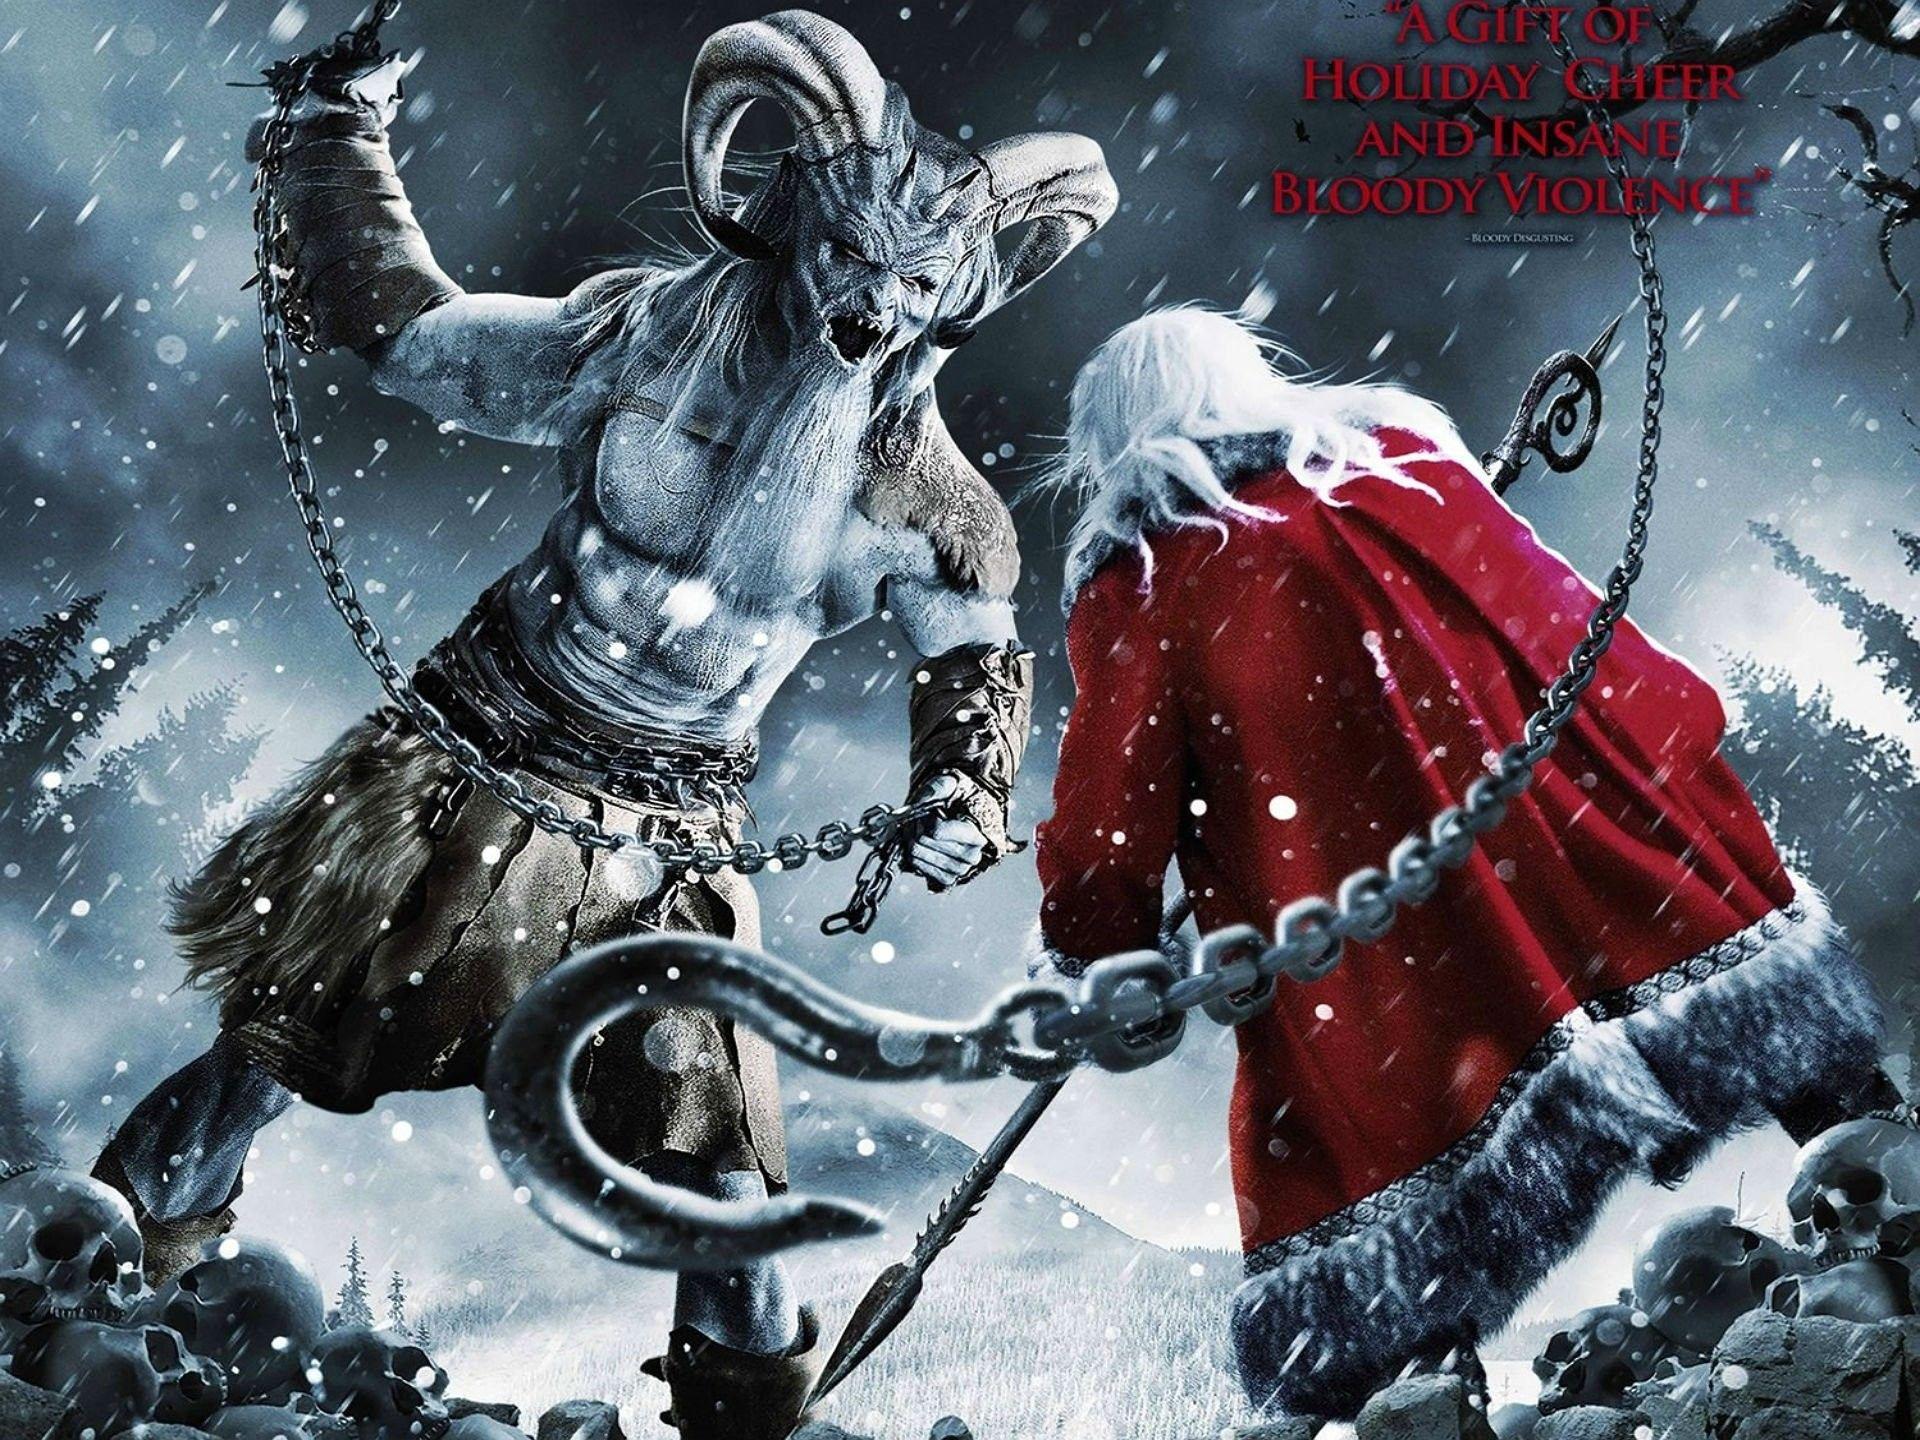 Res 1920x1440 View Artwork Christmas Demon Free Images Story Krampus Horror Monster Ev Christmas Horror Story Christmas Horror Christmas Horror Movies